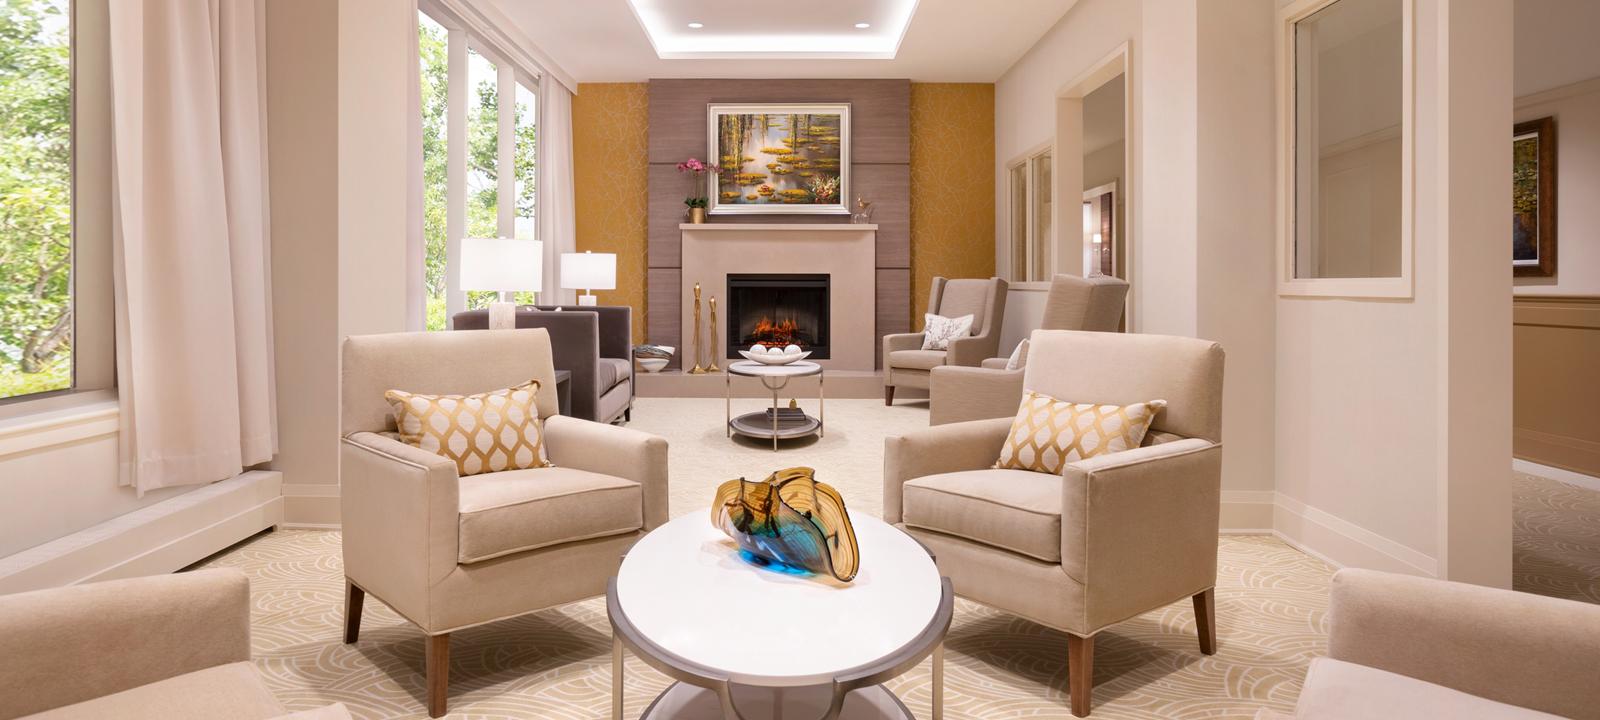 Amica Swan Lake - Fireplace Lounge